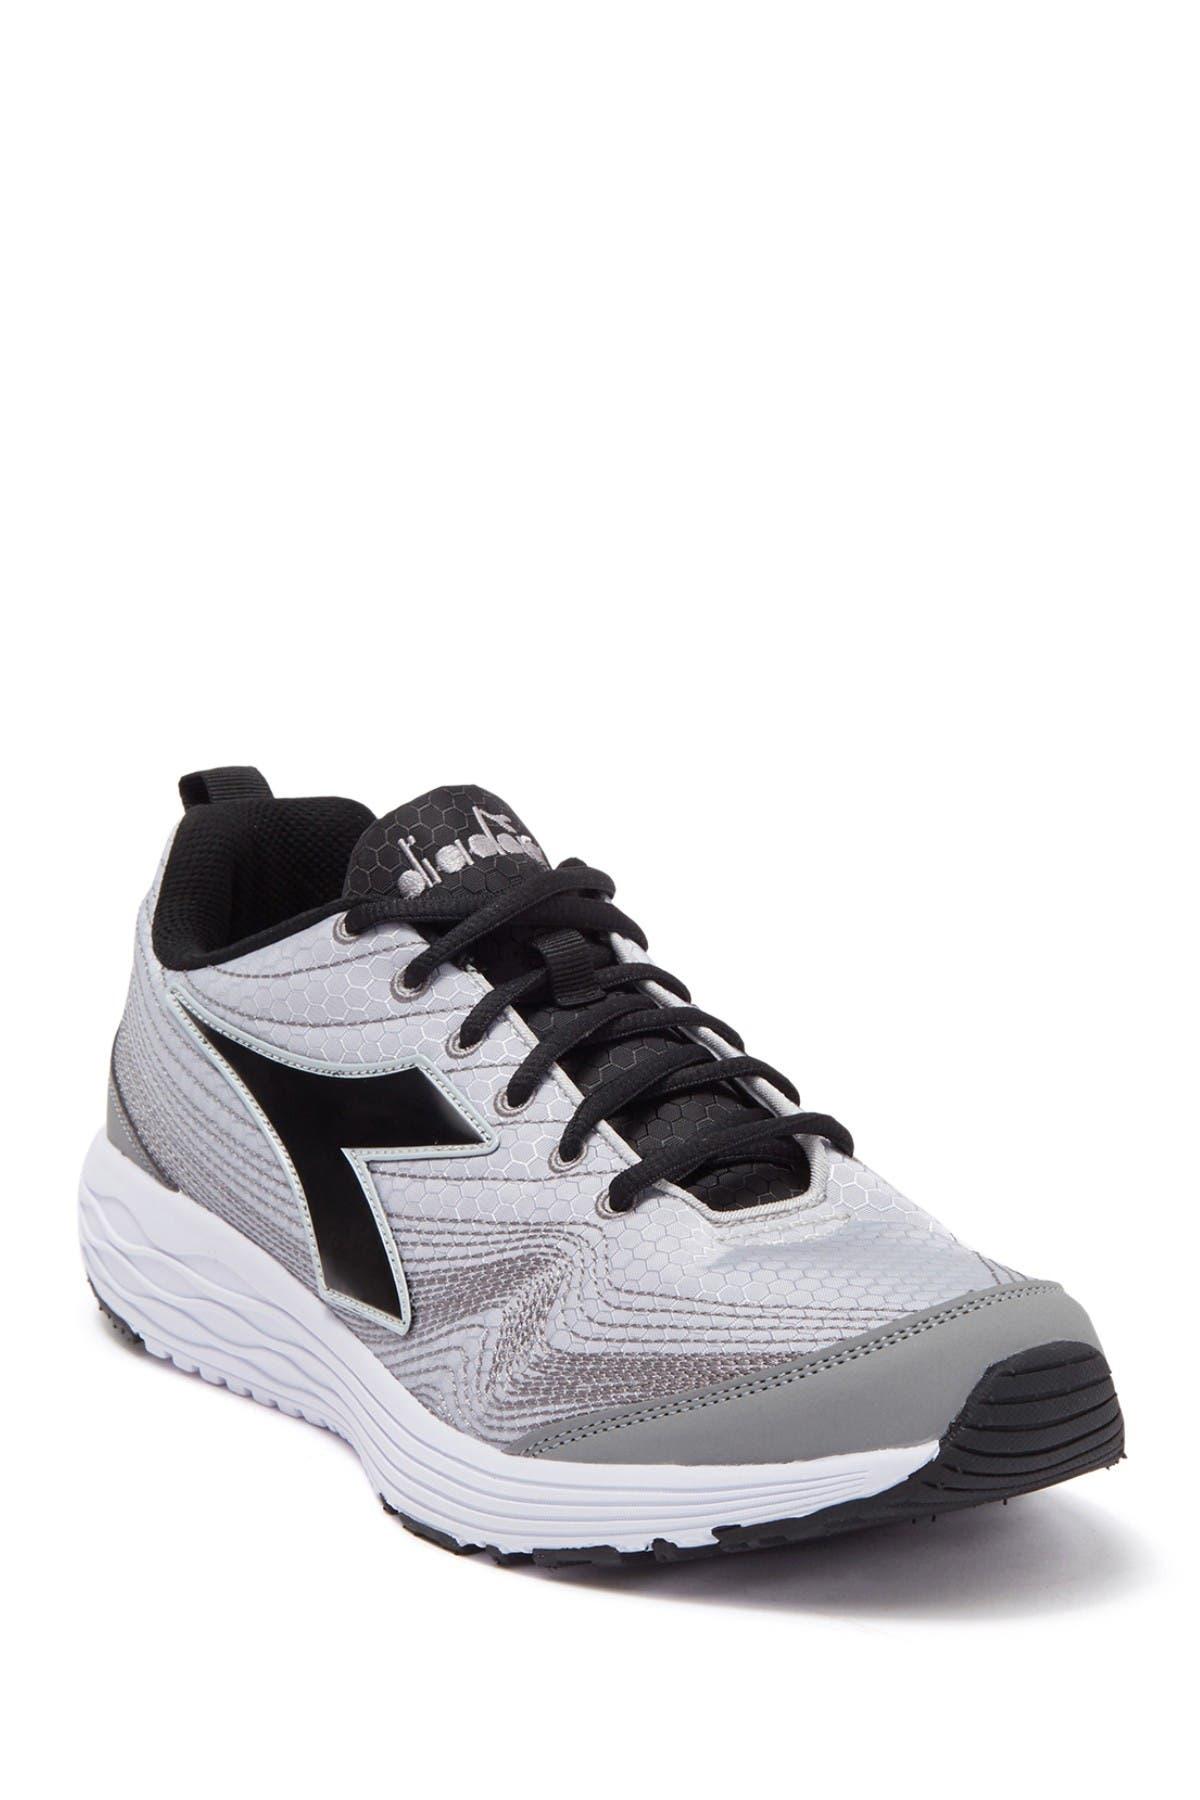 Image of Diadora Flamingo 2 Running Sneaker